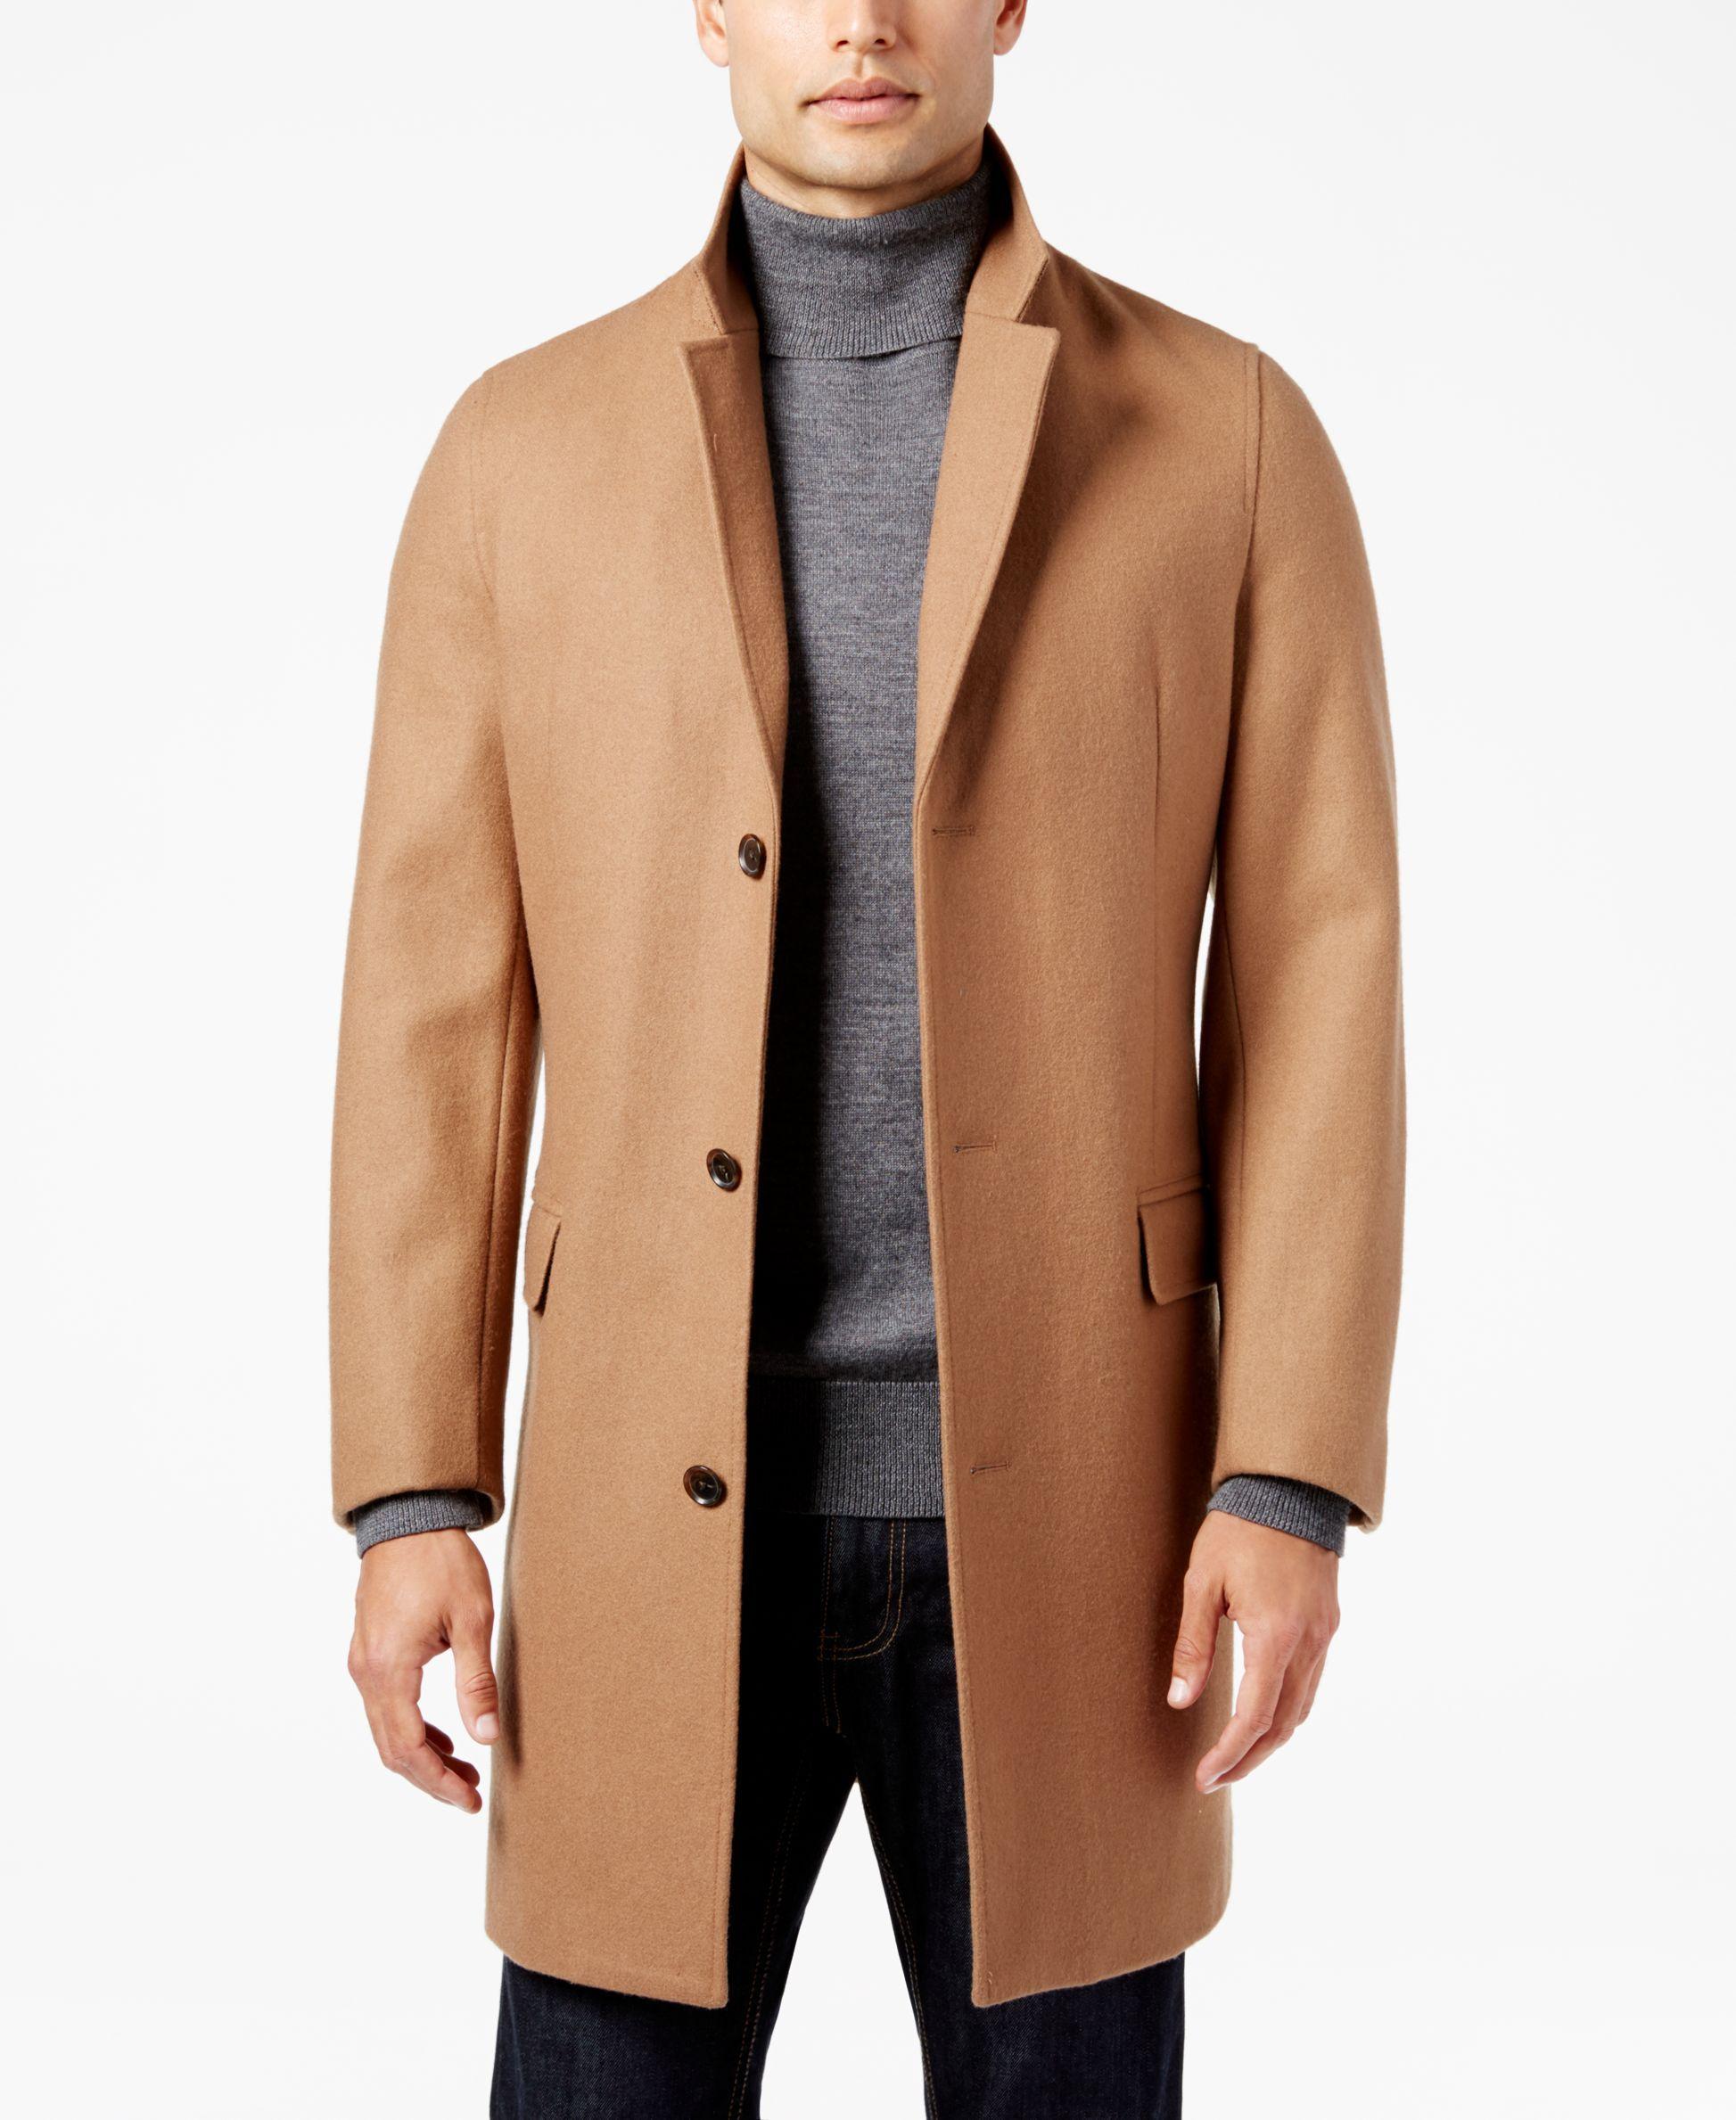 Inc International Concepts Men S Lancaster Top Coat Only At Macy S Mens Fashion Coat Mens Fashion Blazer Mens Fashion Blazer Casual Jackets [ 2378 x 1947 Pixel ]